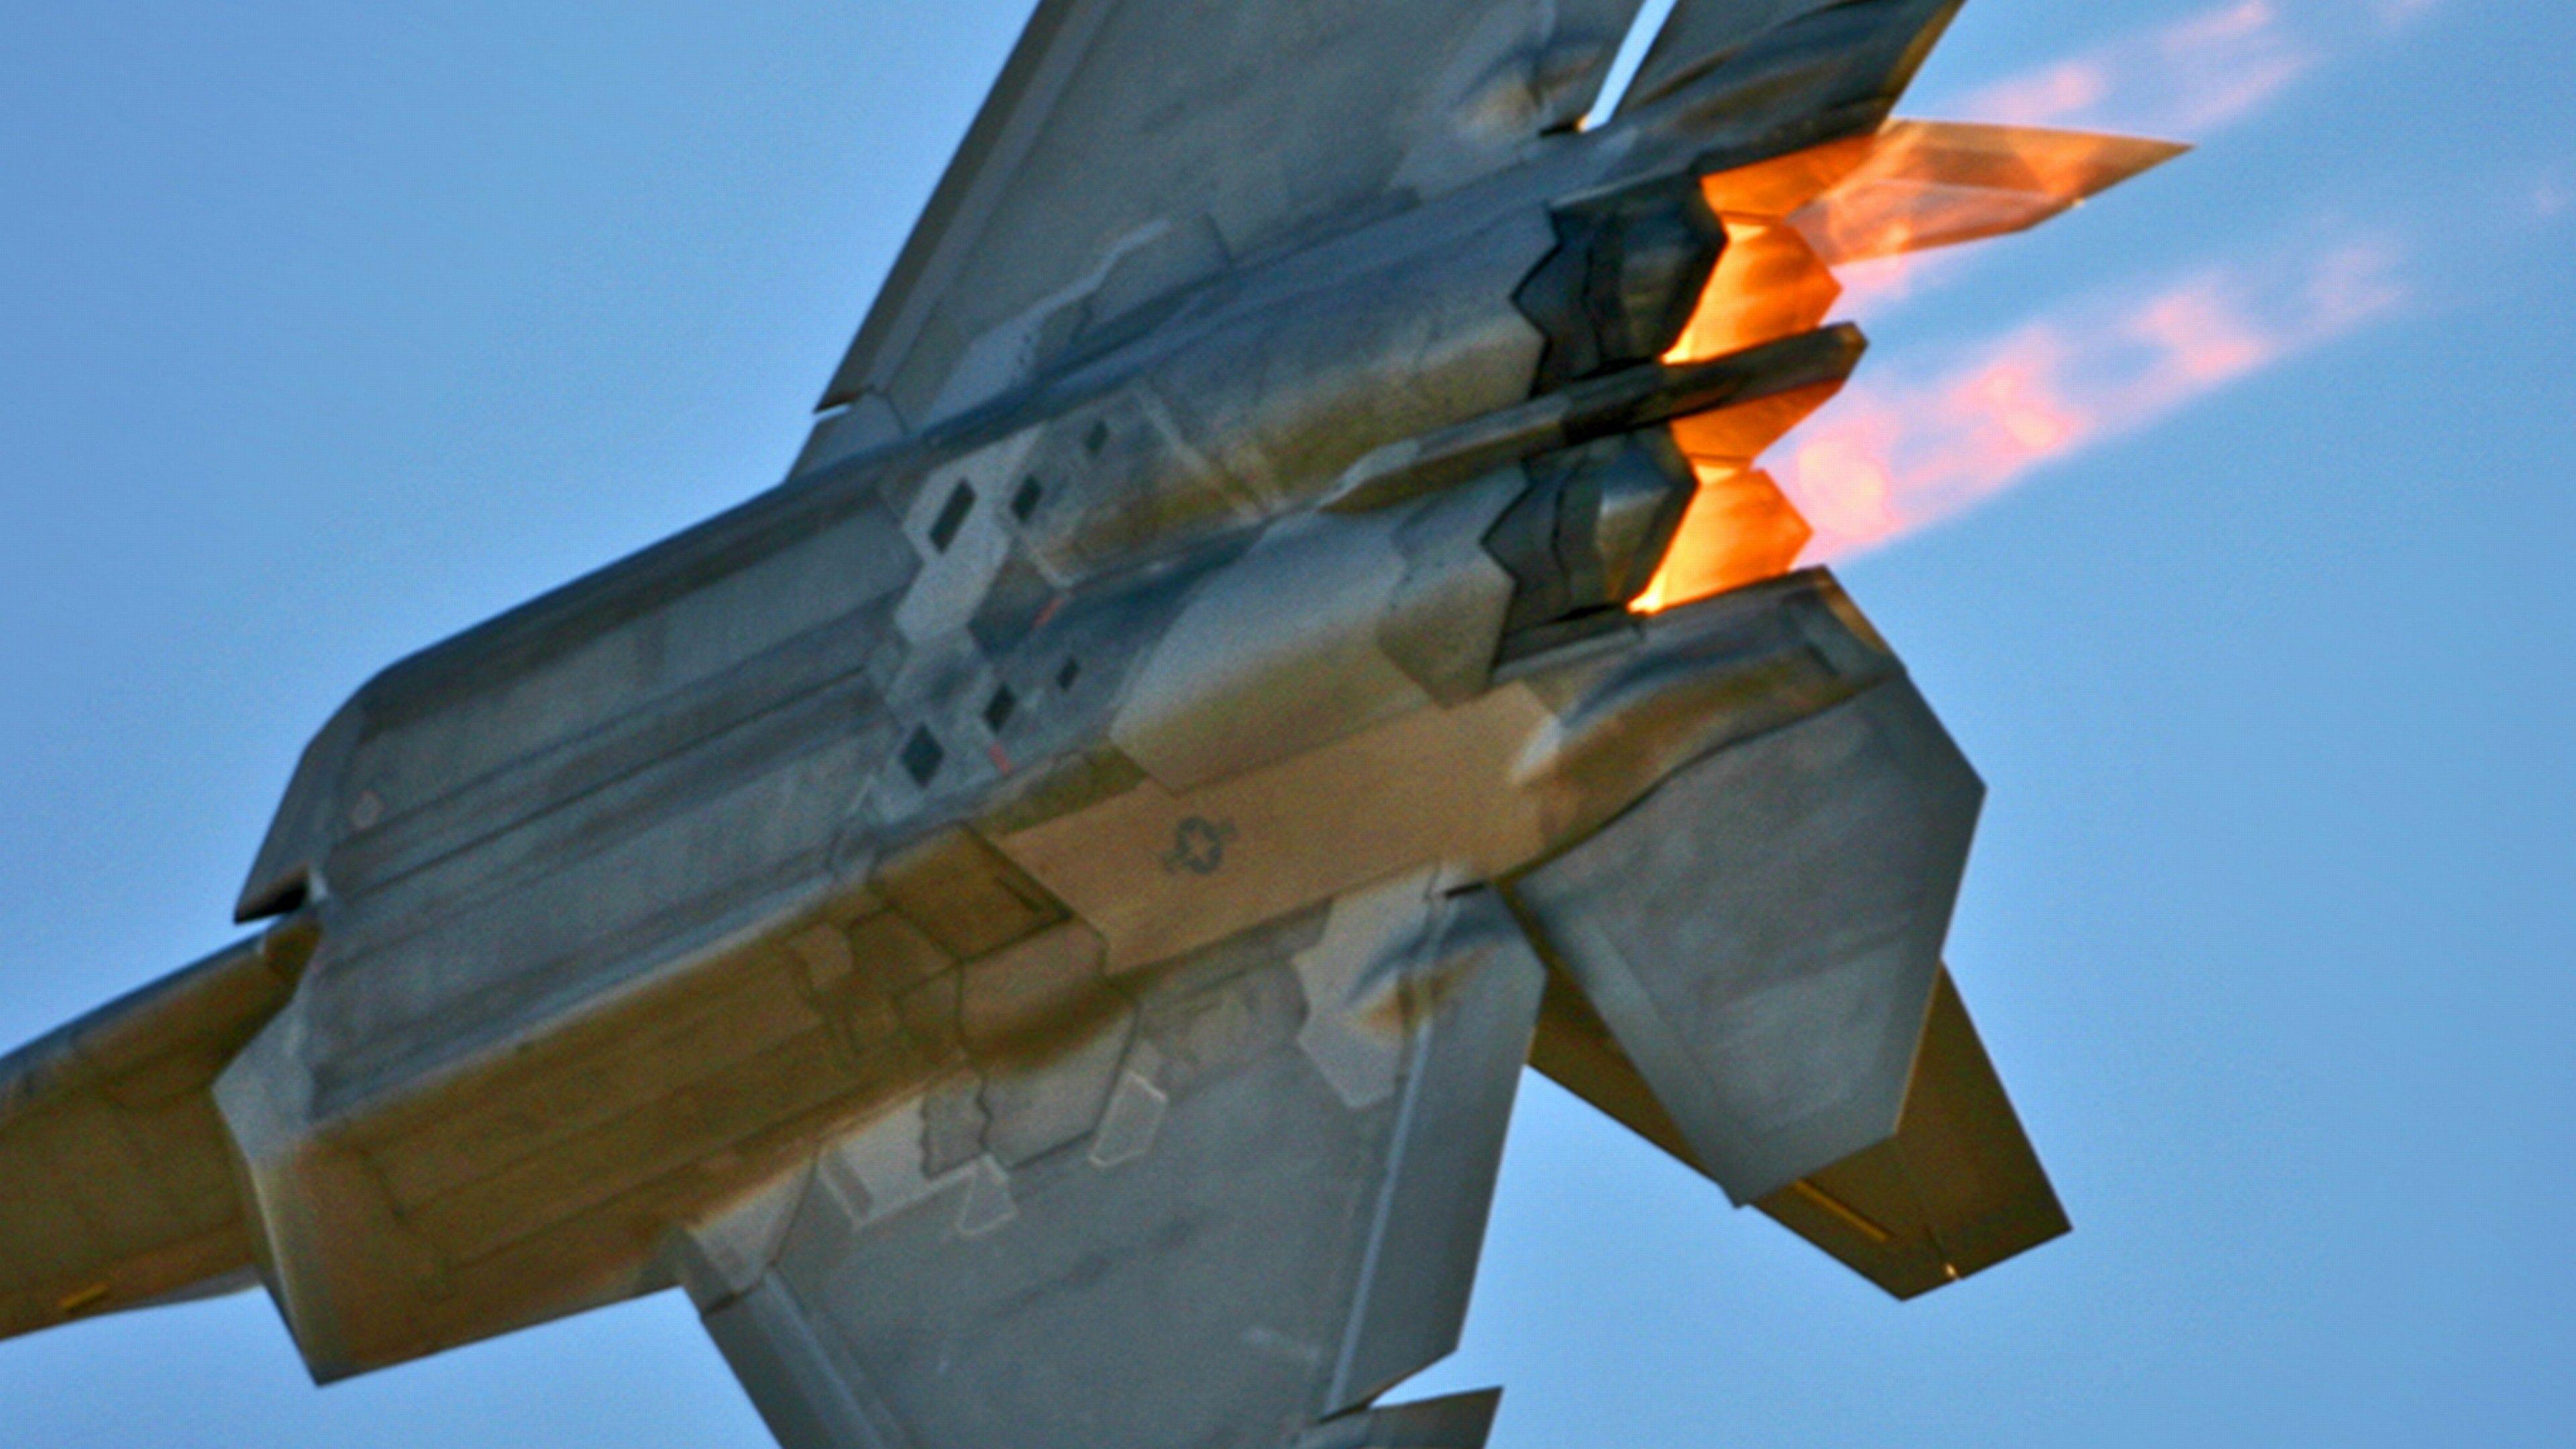 Military F 22 Raptor Fighter Jets Fighter Jets High Resolution